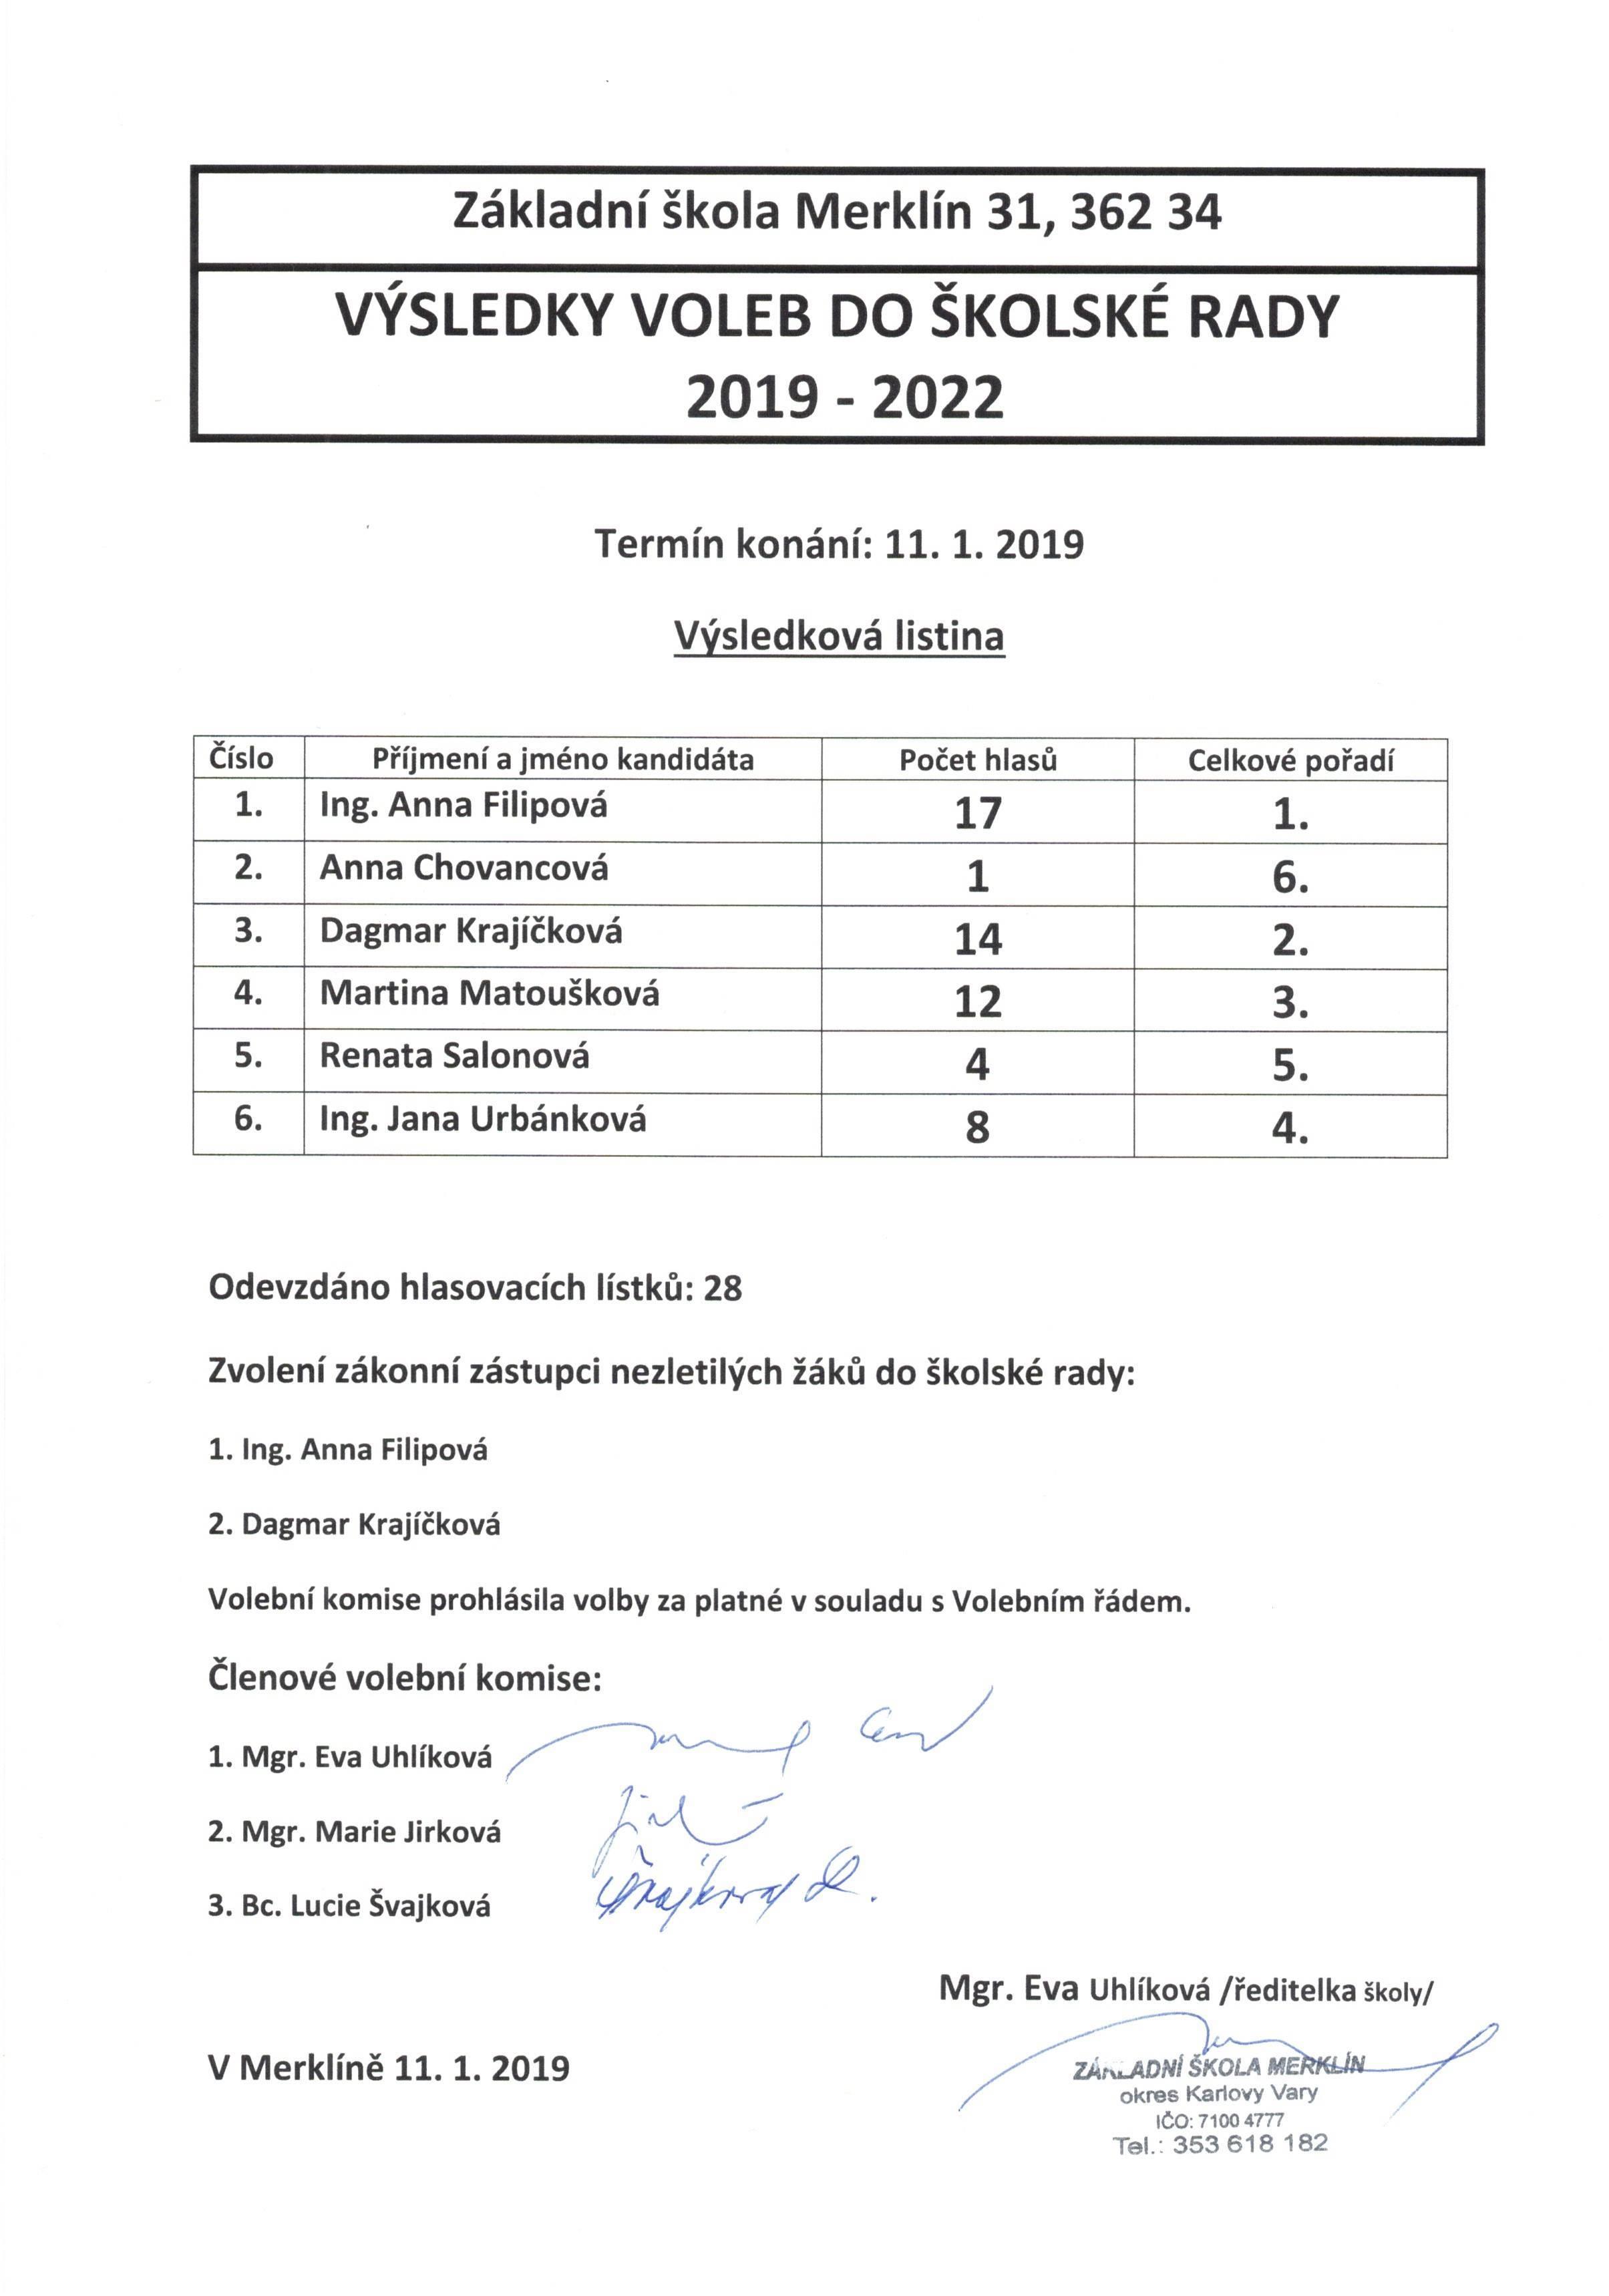 Výsledky voleb do školské rady